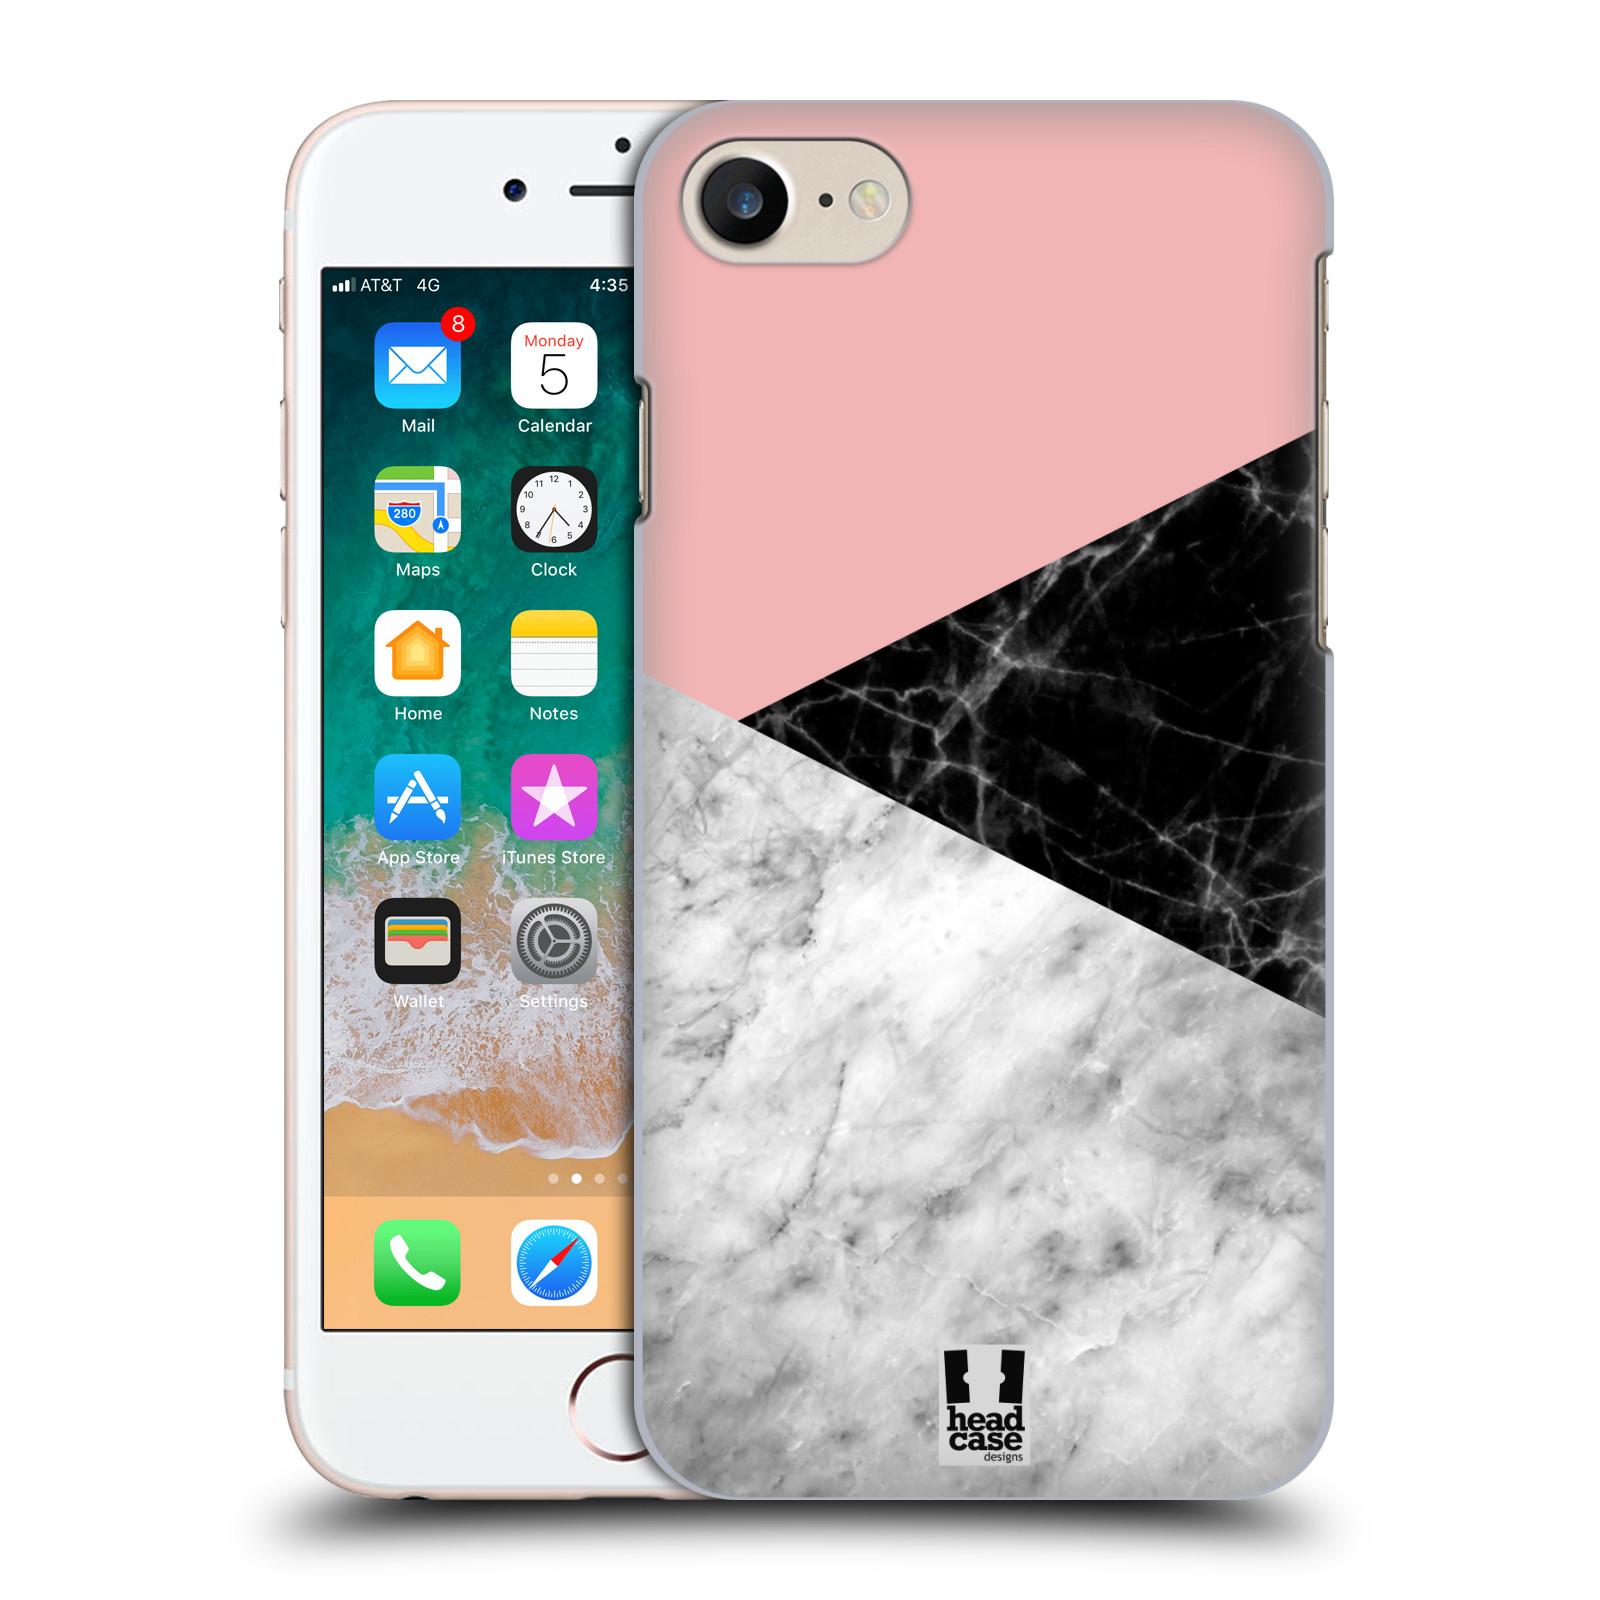 Plastové pouzdro na mobil Apple iPhone SE (2020) - Head Case - Mramor mix